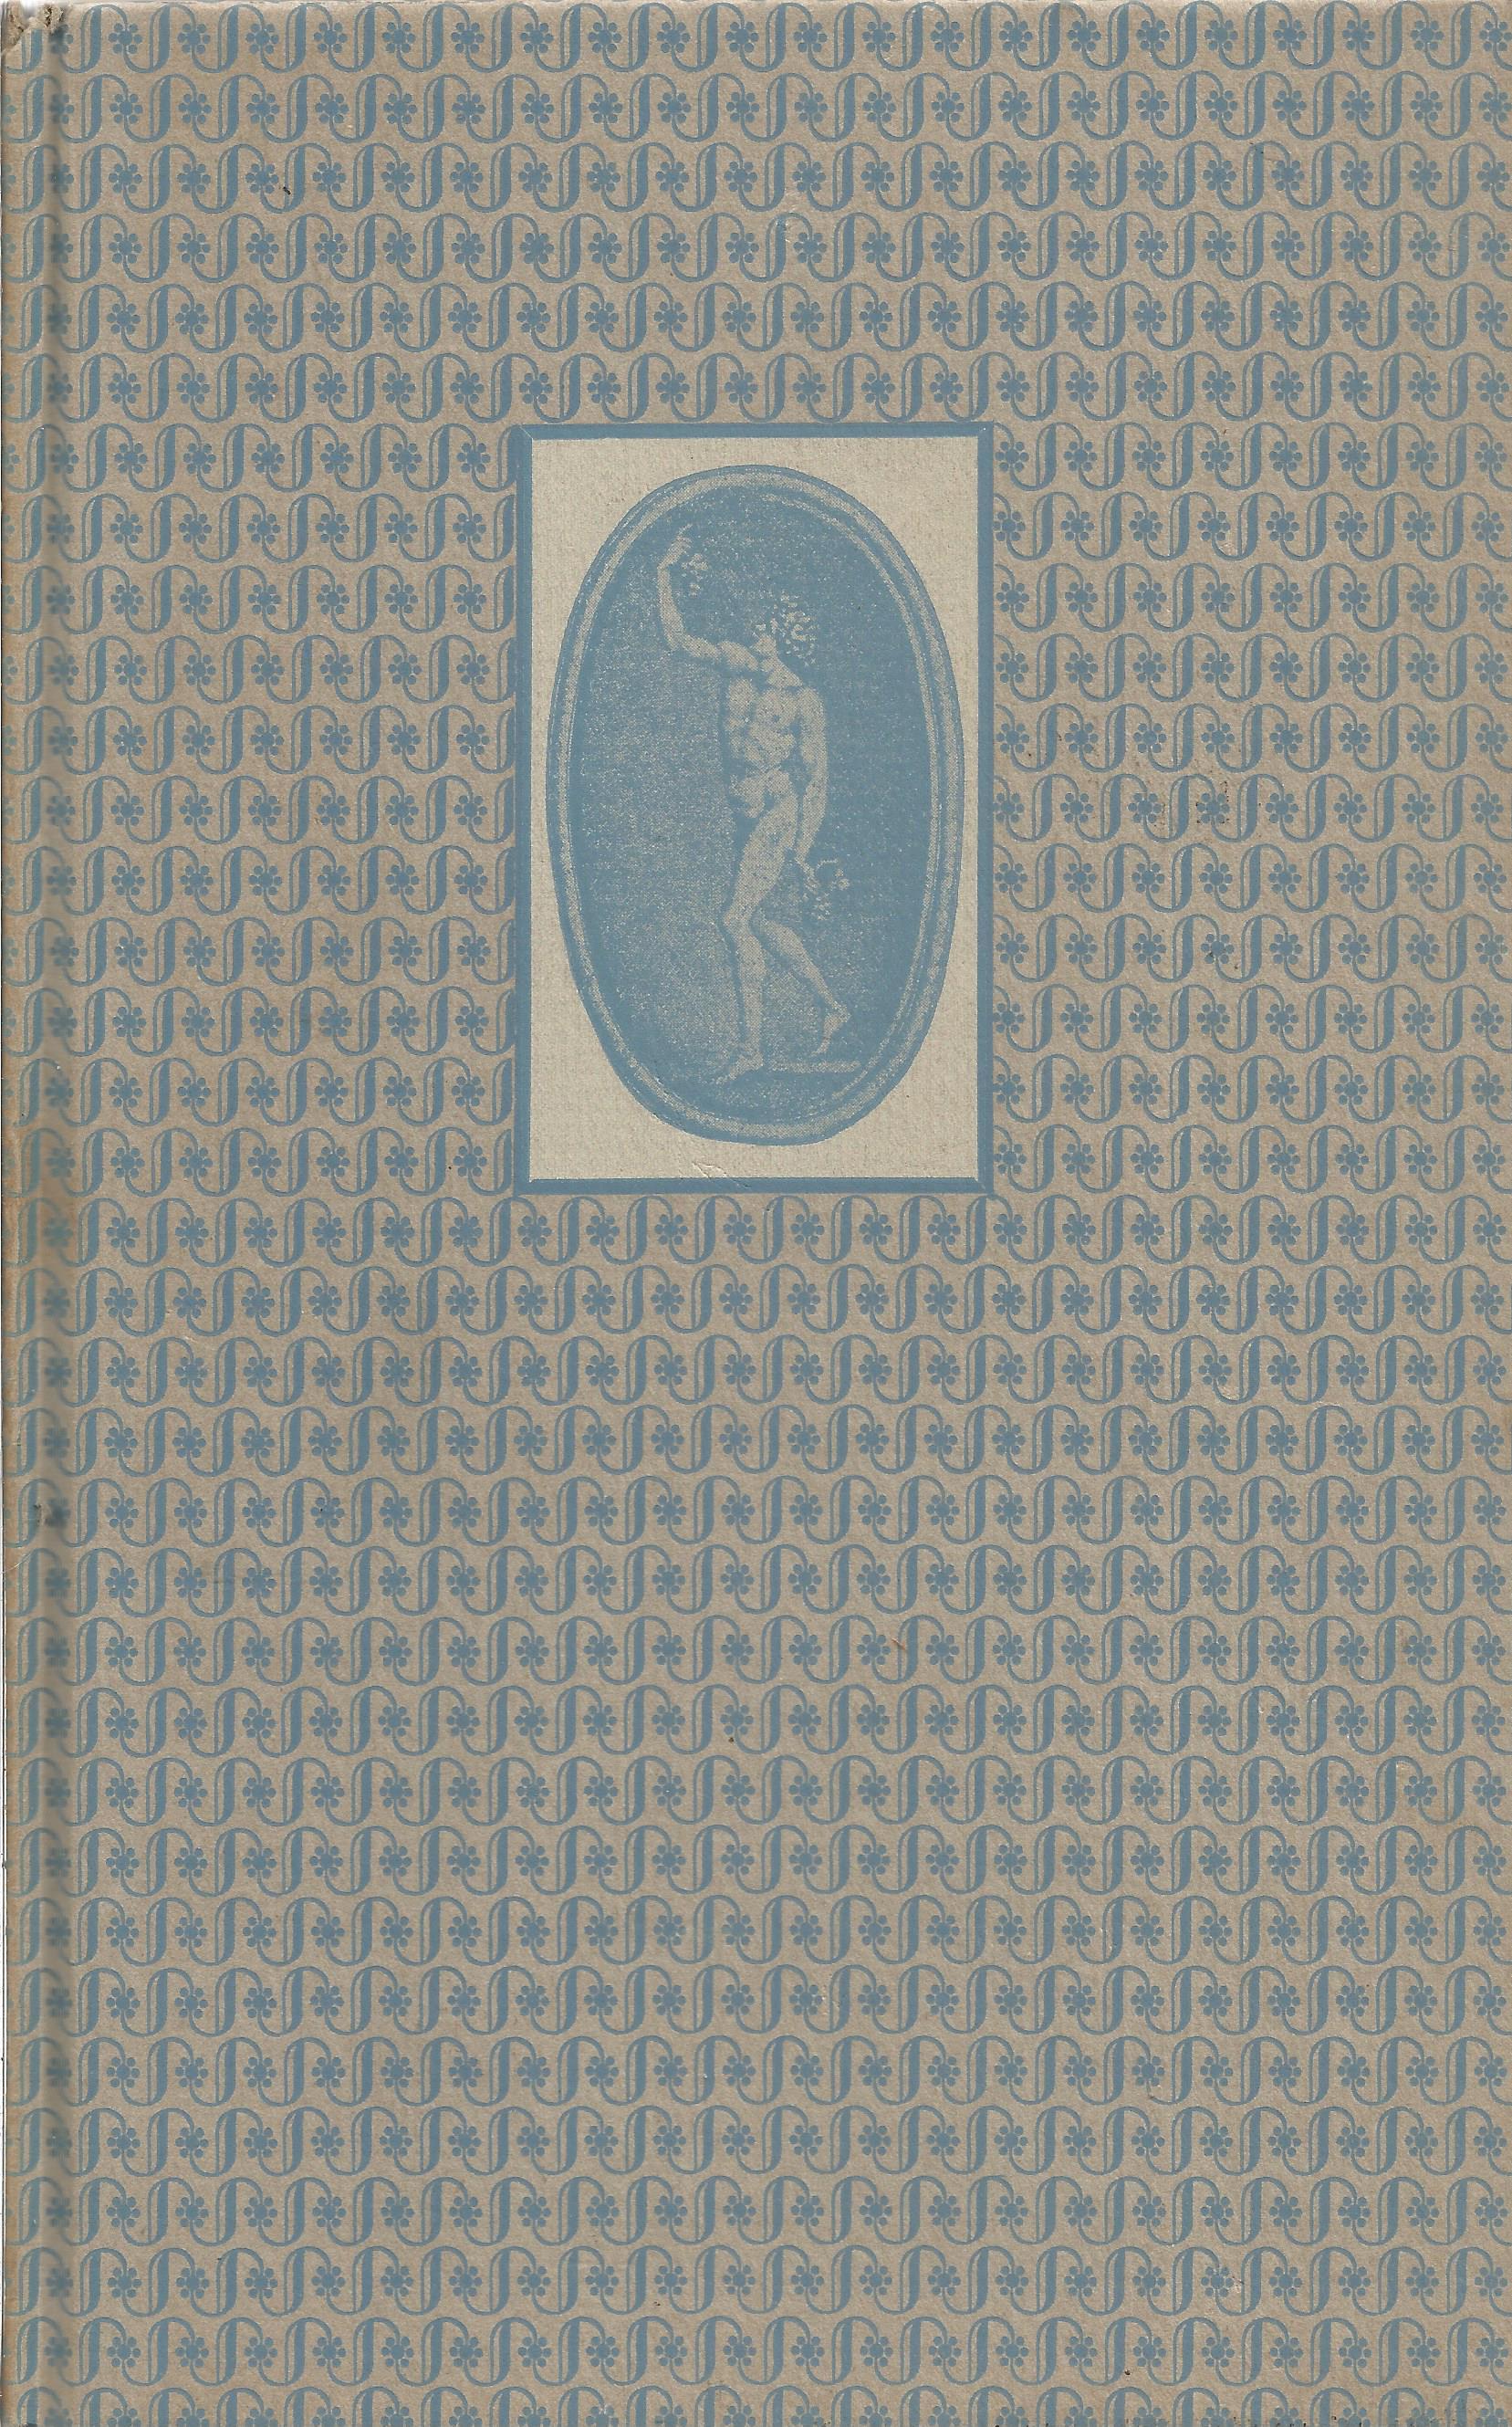 Hardback Book John Milton Poems L'Allegro, Il Penseroso, Comus Lycidas published by The Peter Pauper